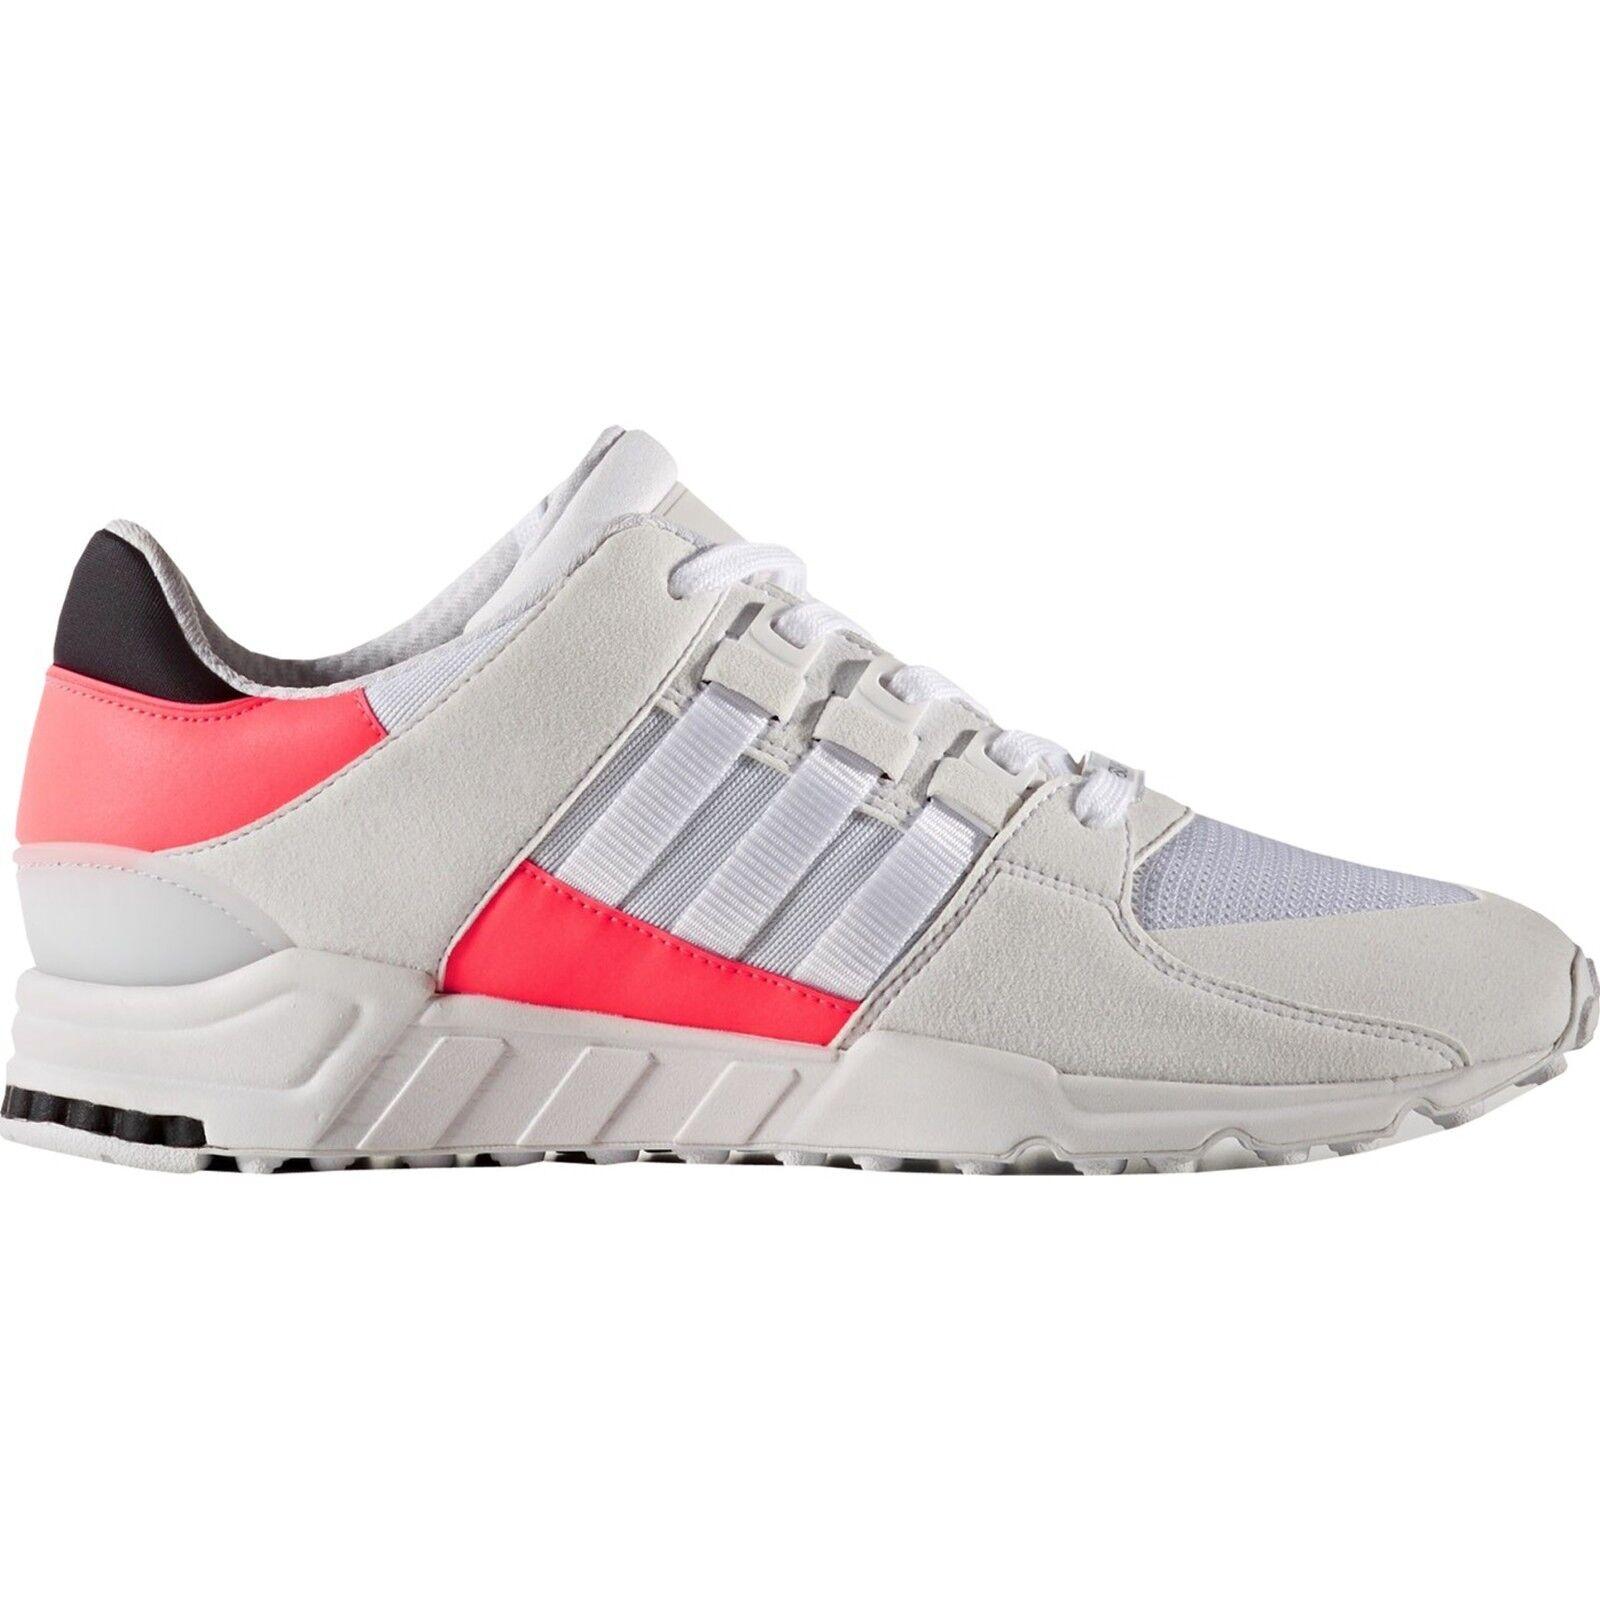 the latest 30f38 ece80 Adidas EQT Support RF bianca Turbo rosso rosa BA7716 Equipment Equipment  Equipment 8 9.5 13 Running 98202e